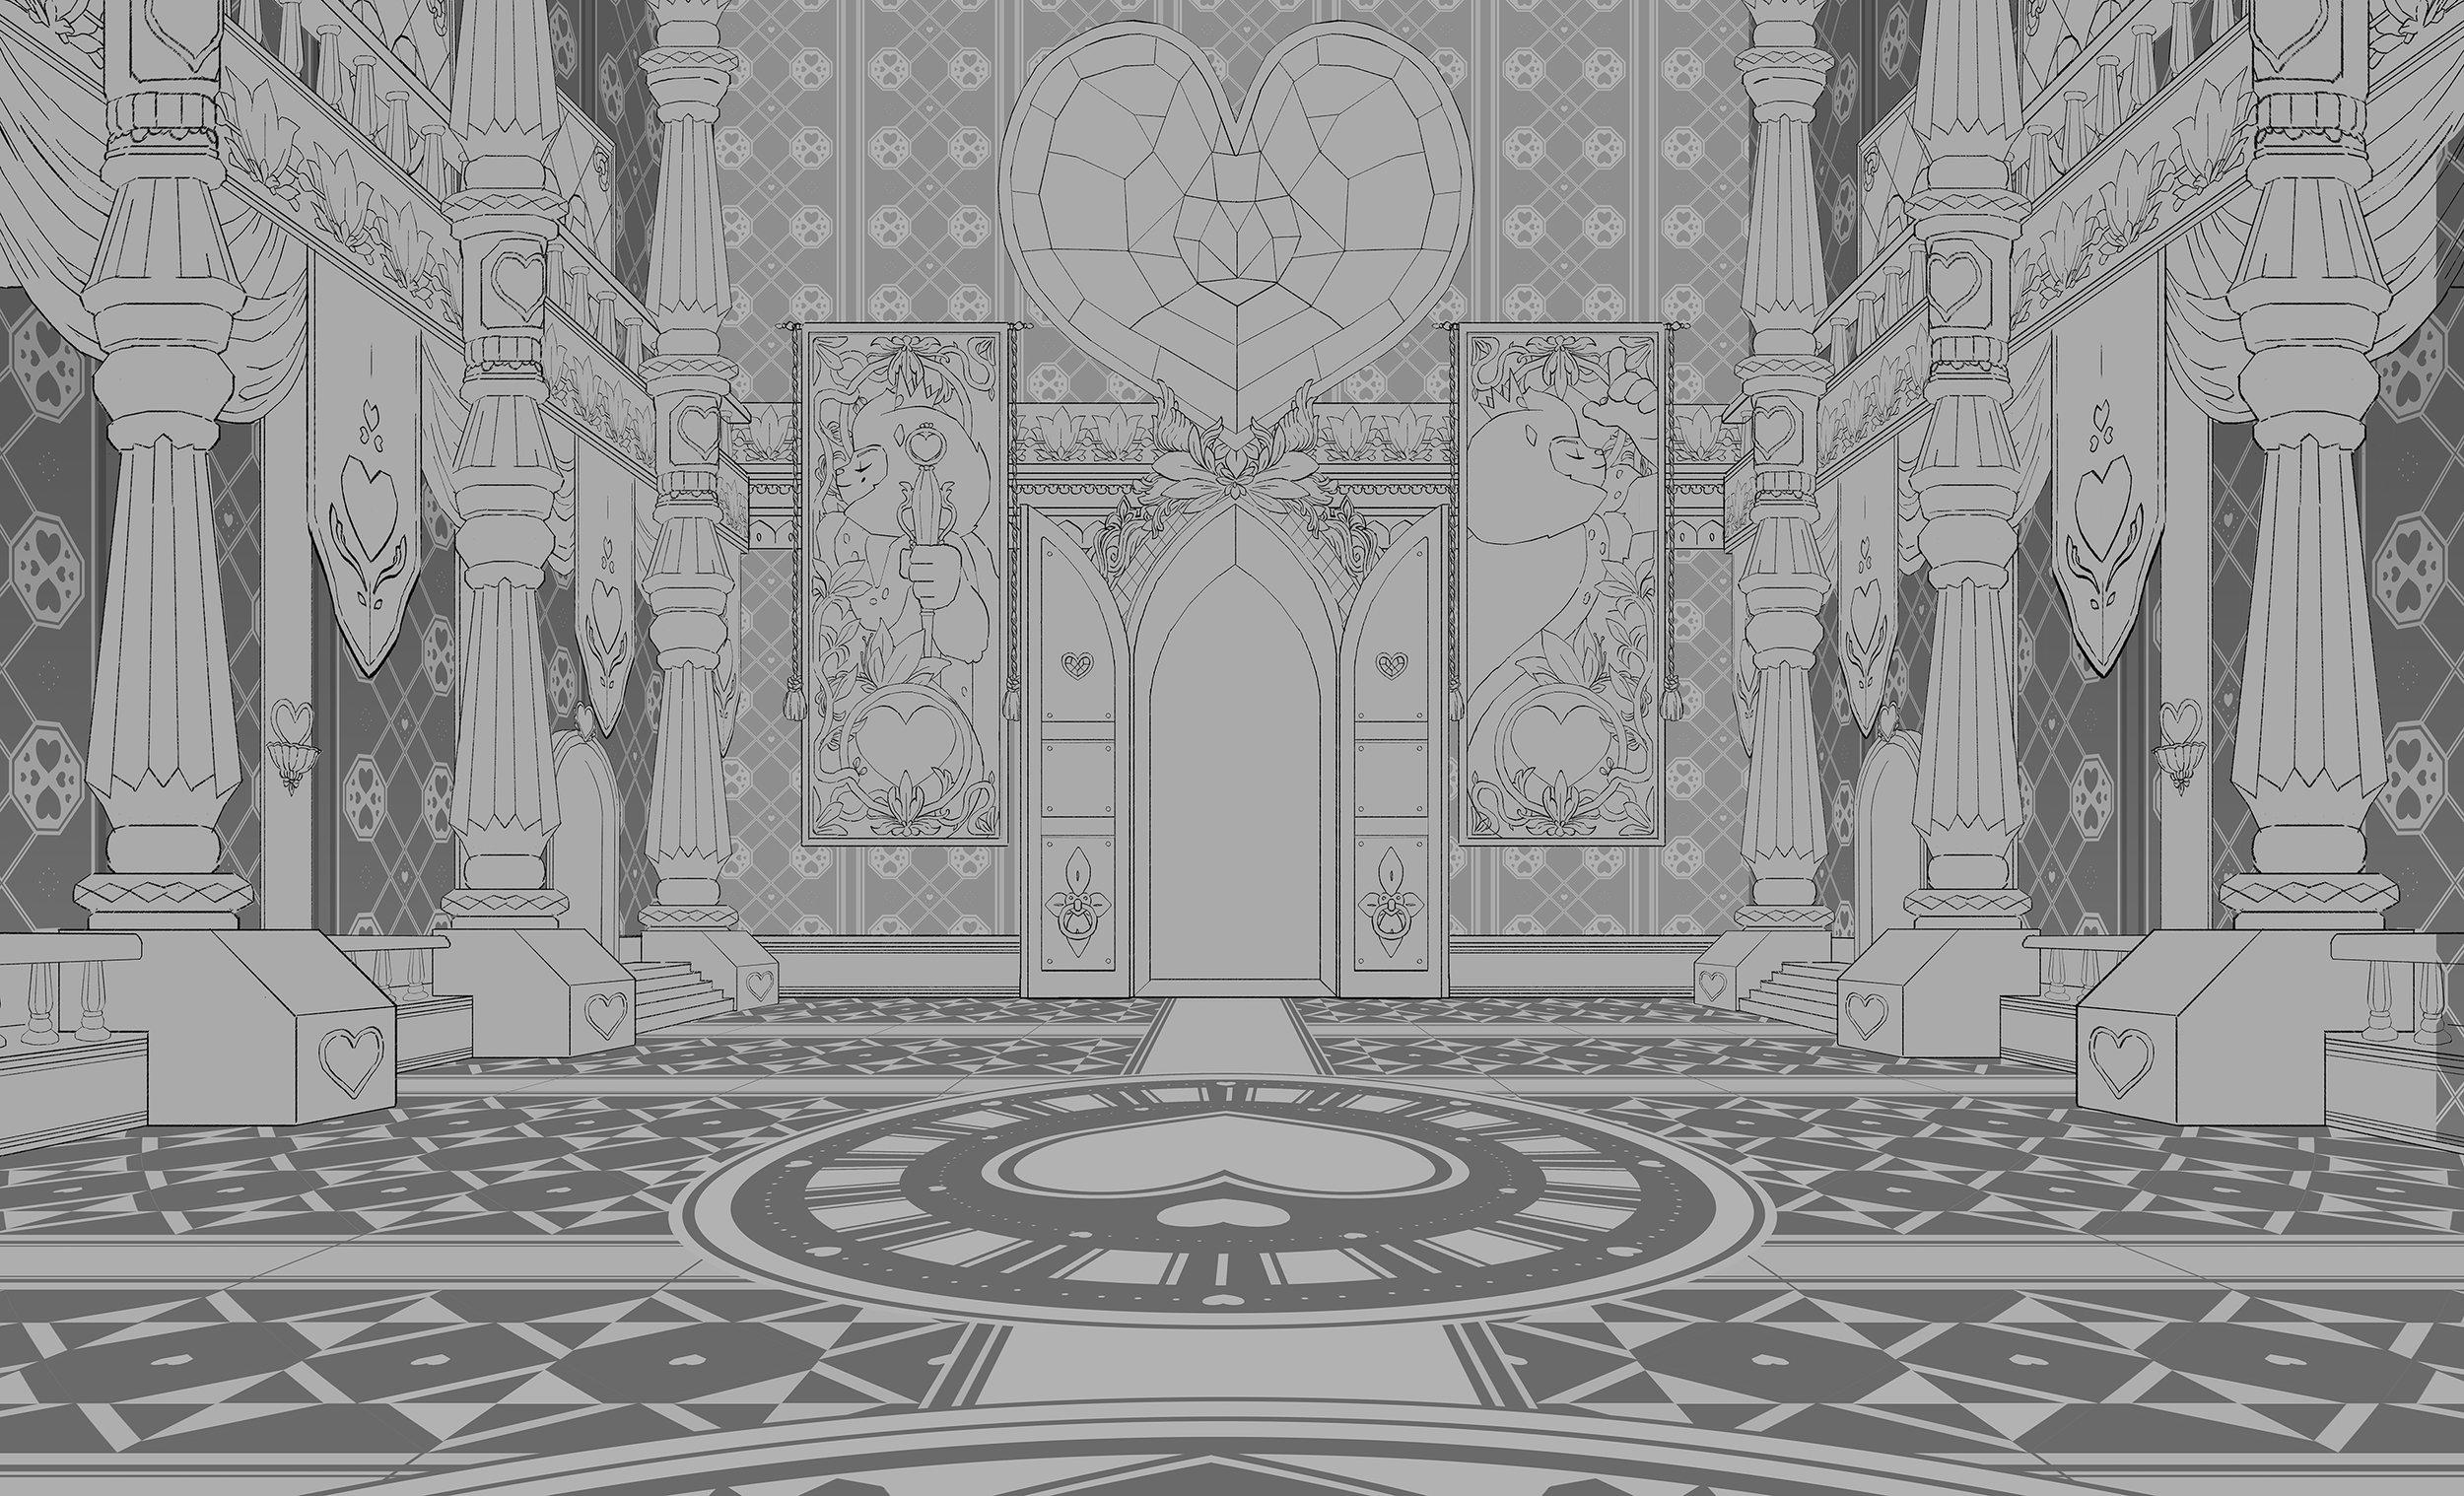 MM102_BG_A000_Int_Pure_Heart_Palace_Kings_Room_Rev_V02_LG.jpg